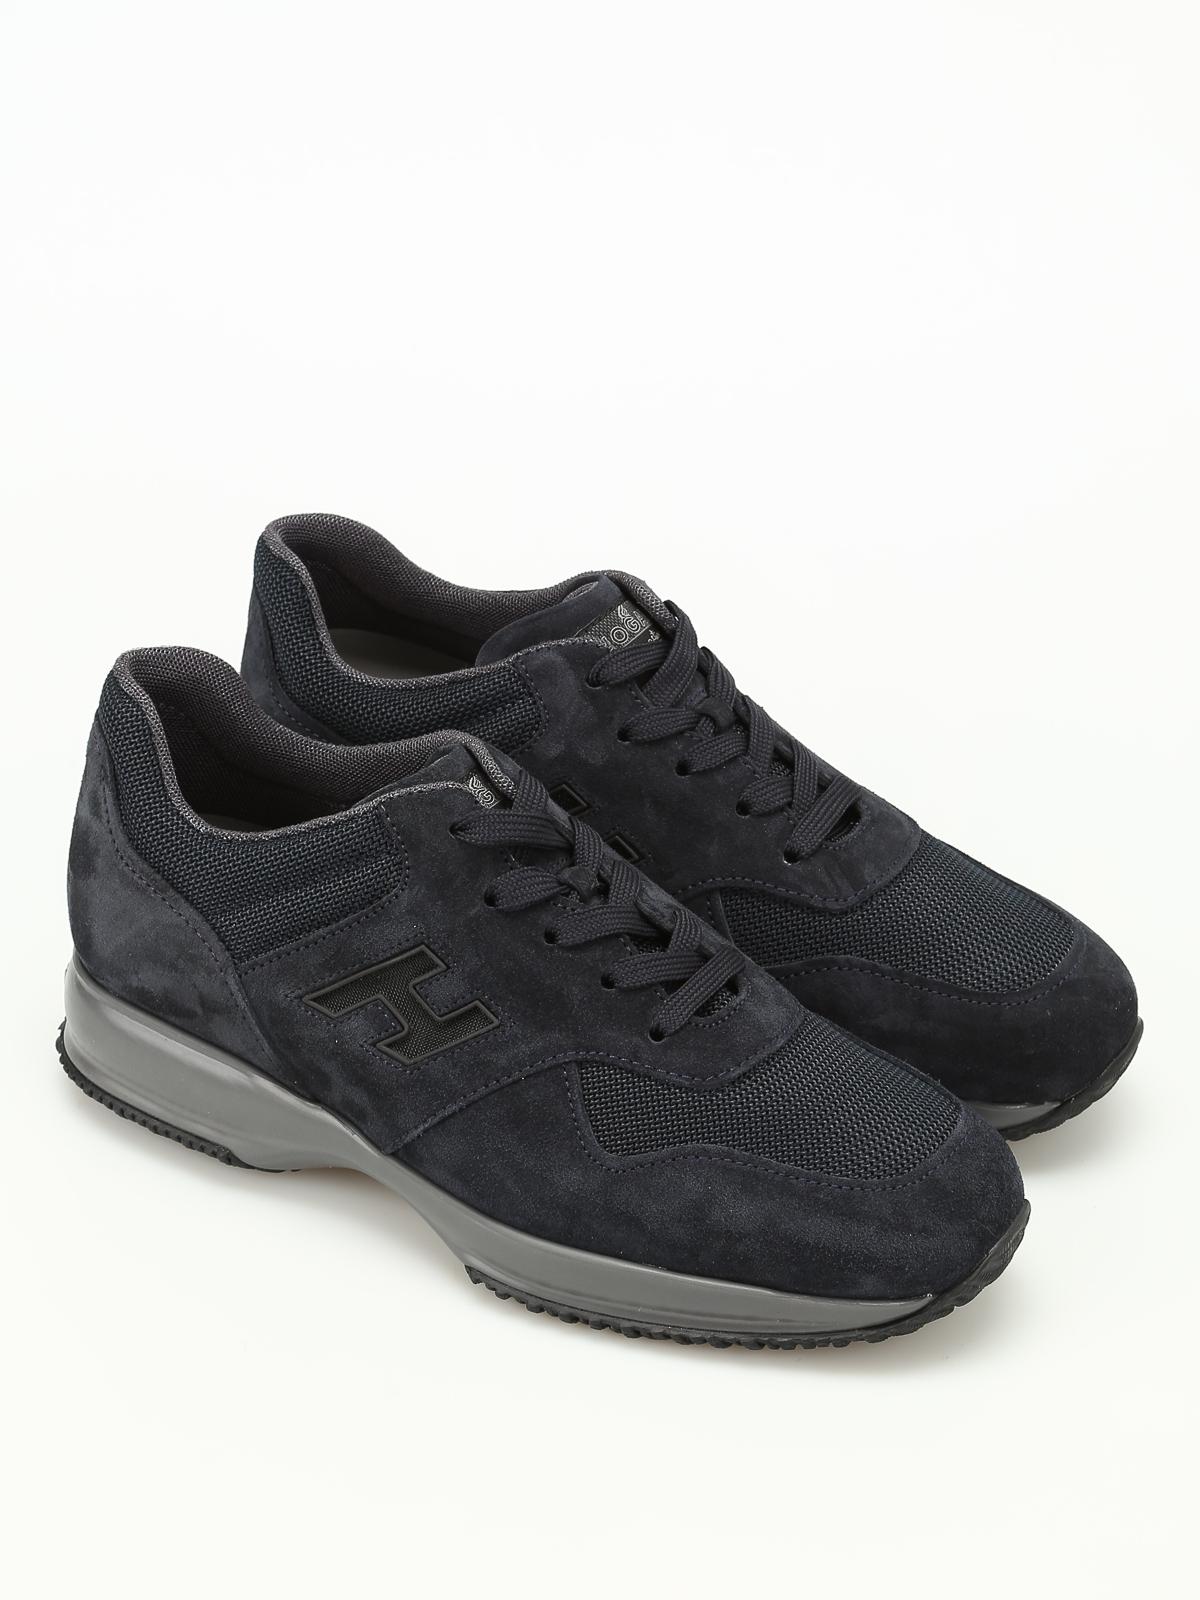 edf2b5f223cc Hogan - Sneaker - Dunkelblau - Sneaker - HXM00N0Y720HJK0501   iKRIX.com